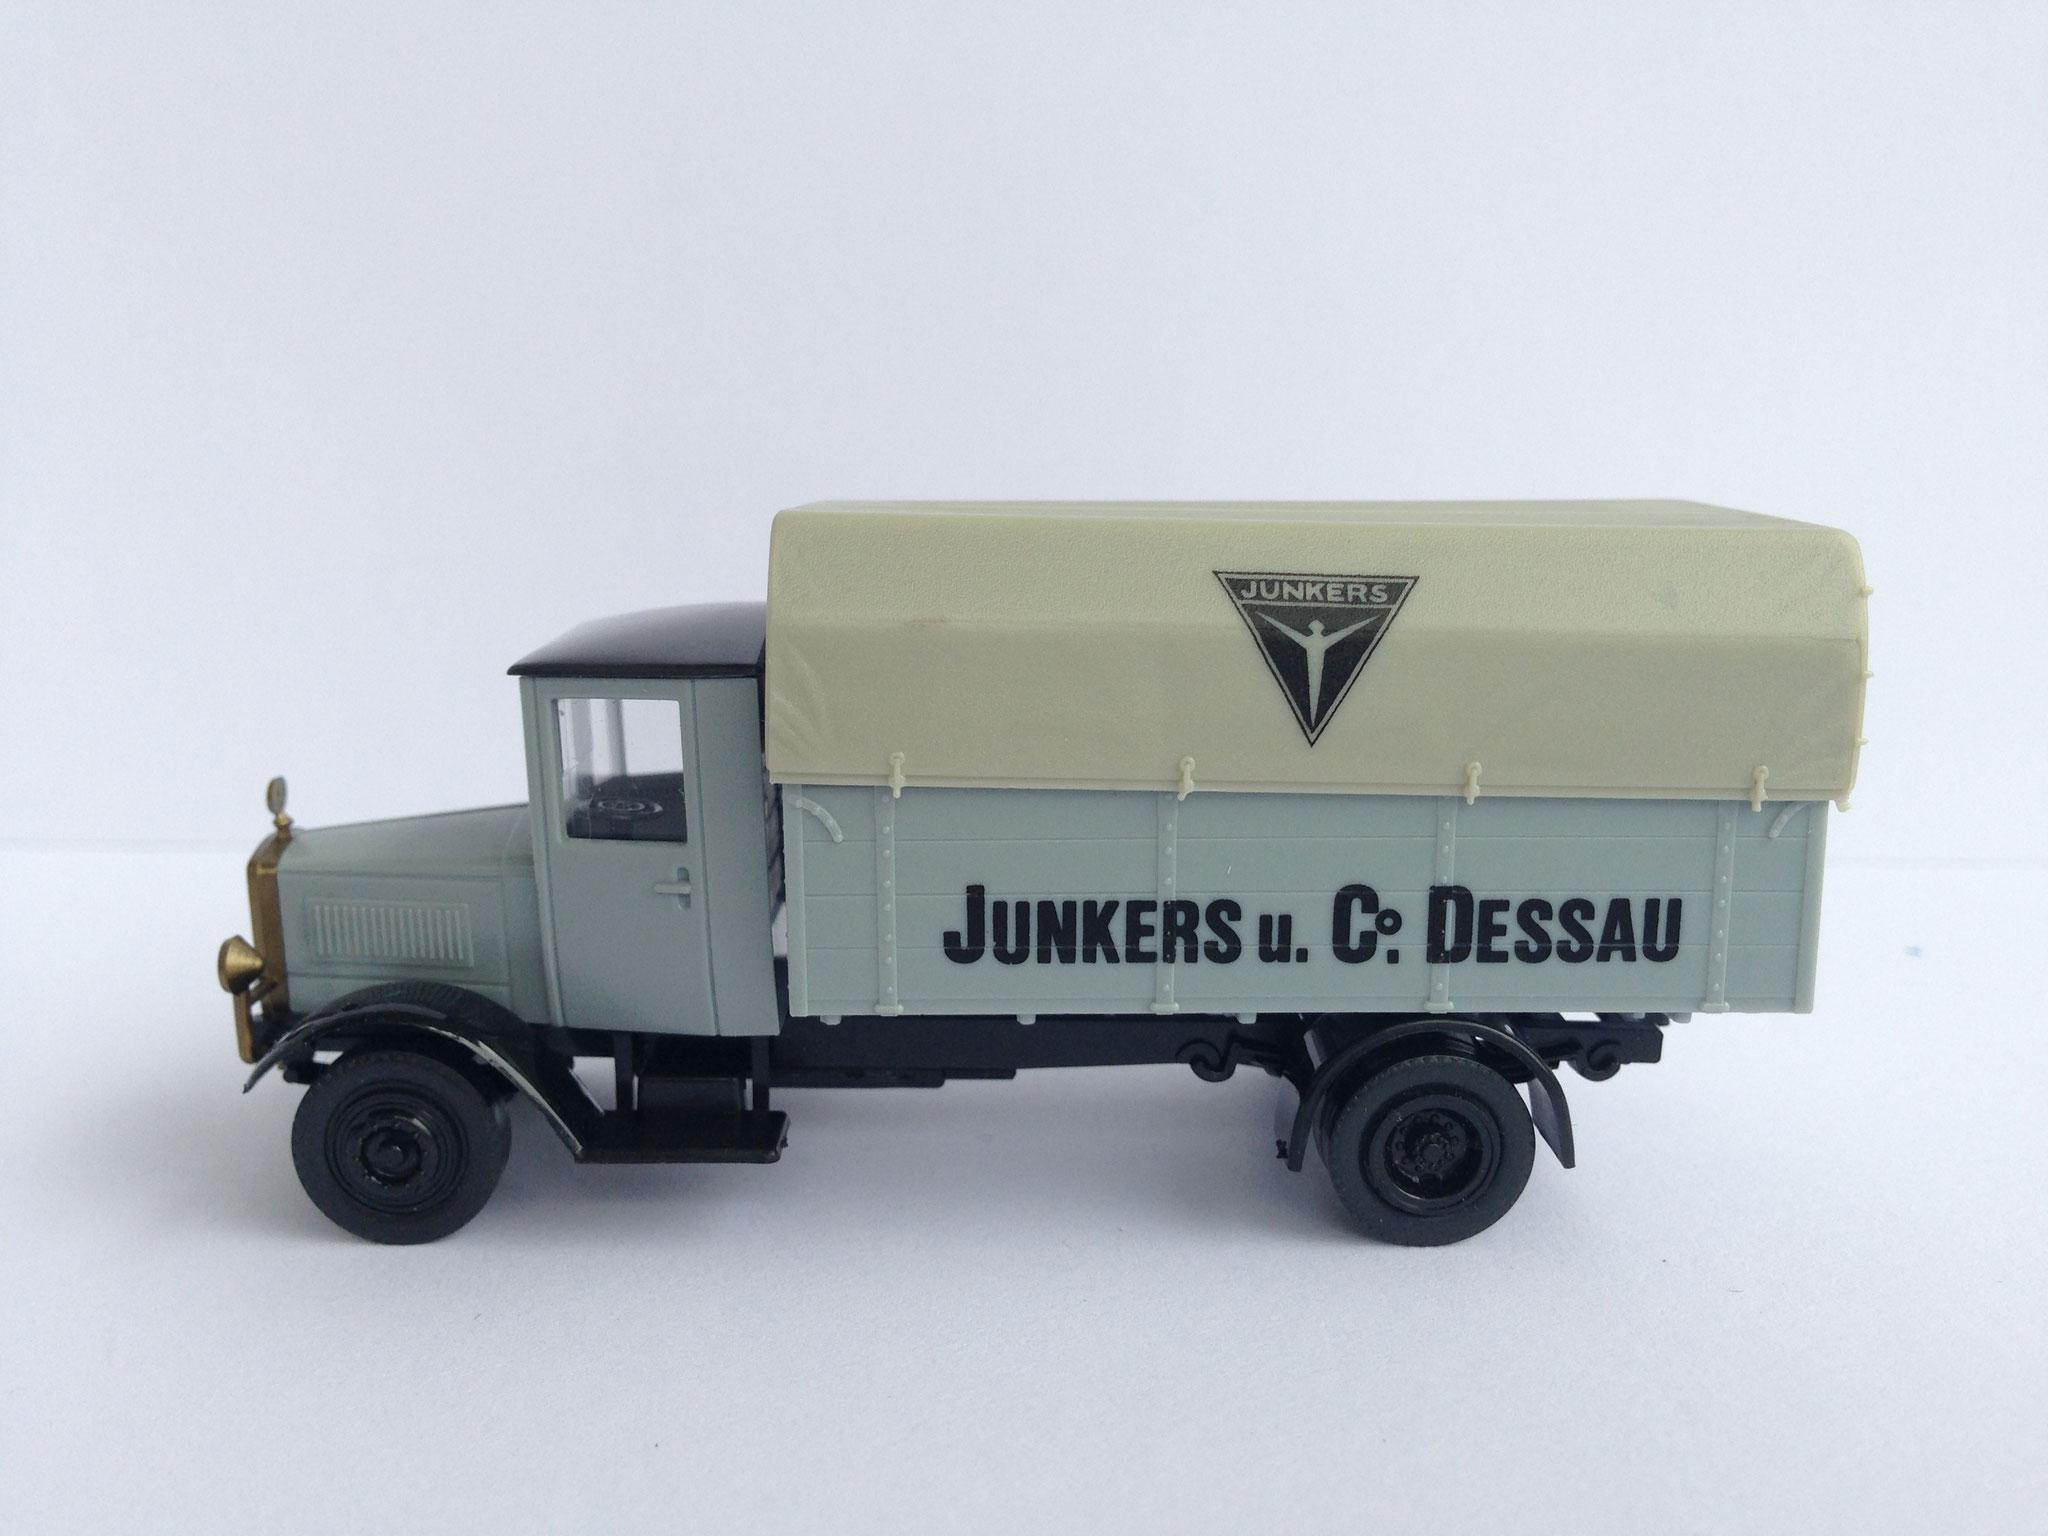 Mercedes L5 Junkers & Co Dessau, hellgrau